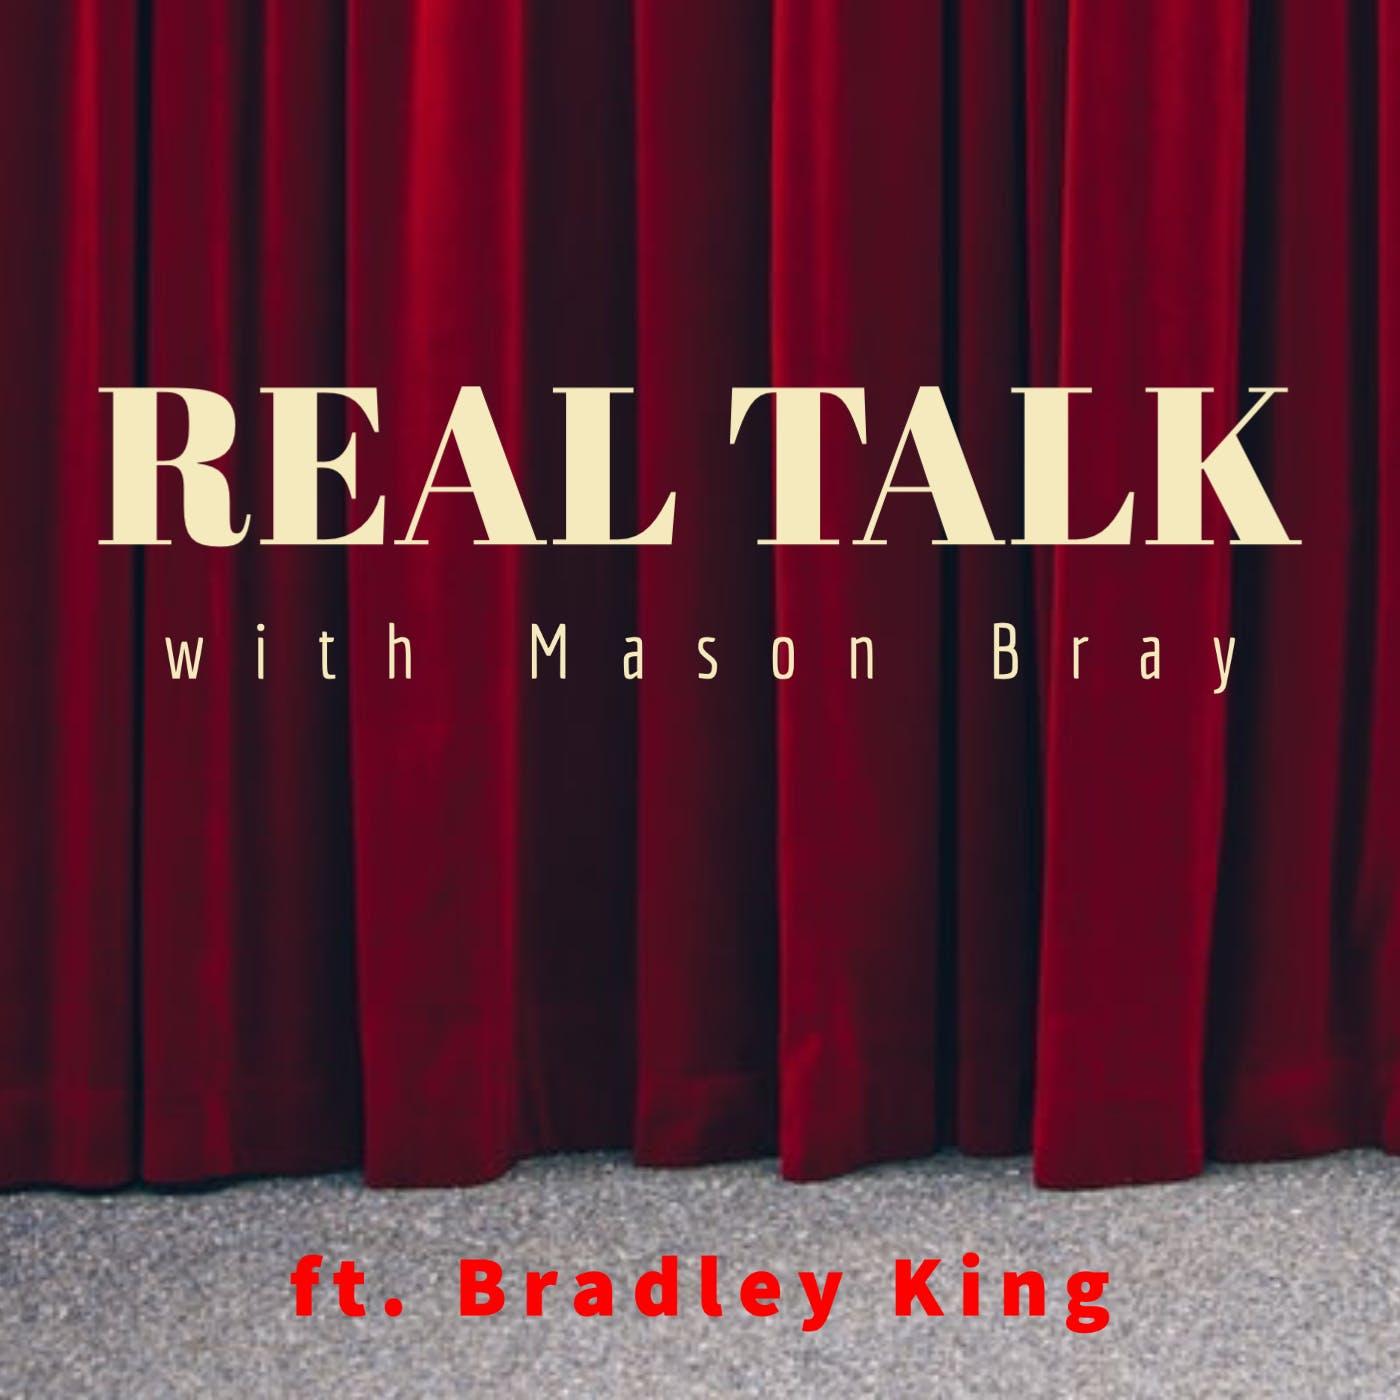 Ep. 503 - BROADWAY TALKS with a Lighting Designer - Bradley King